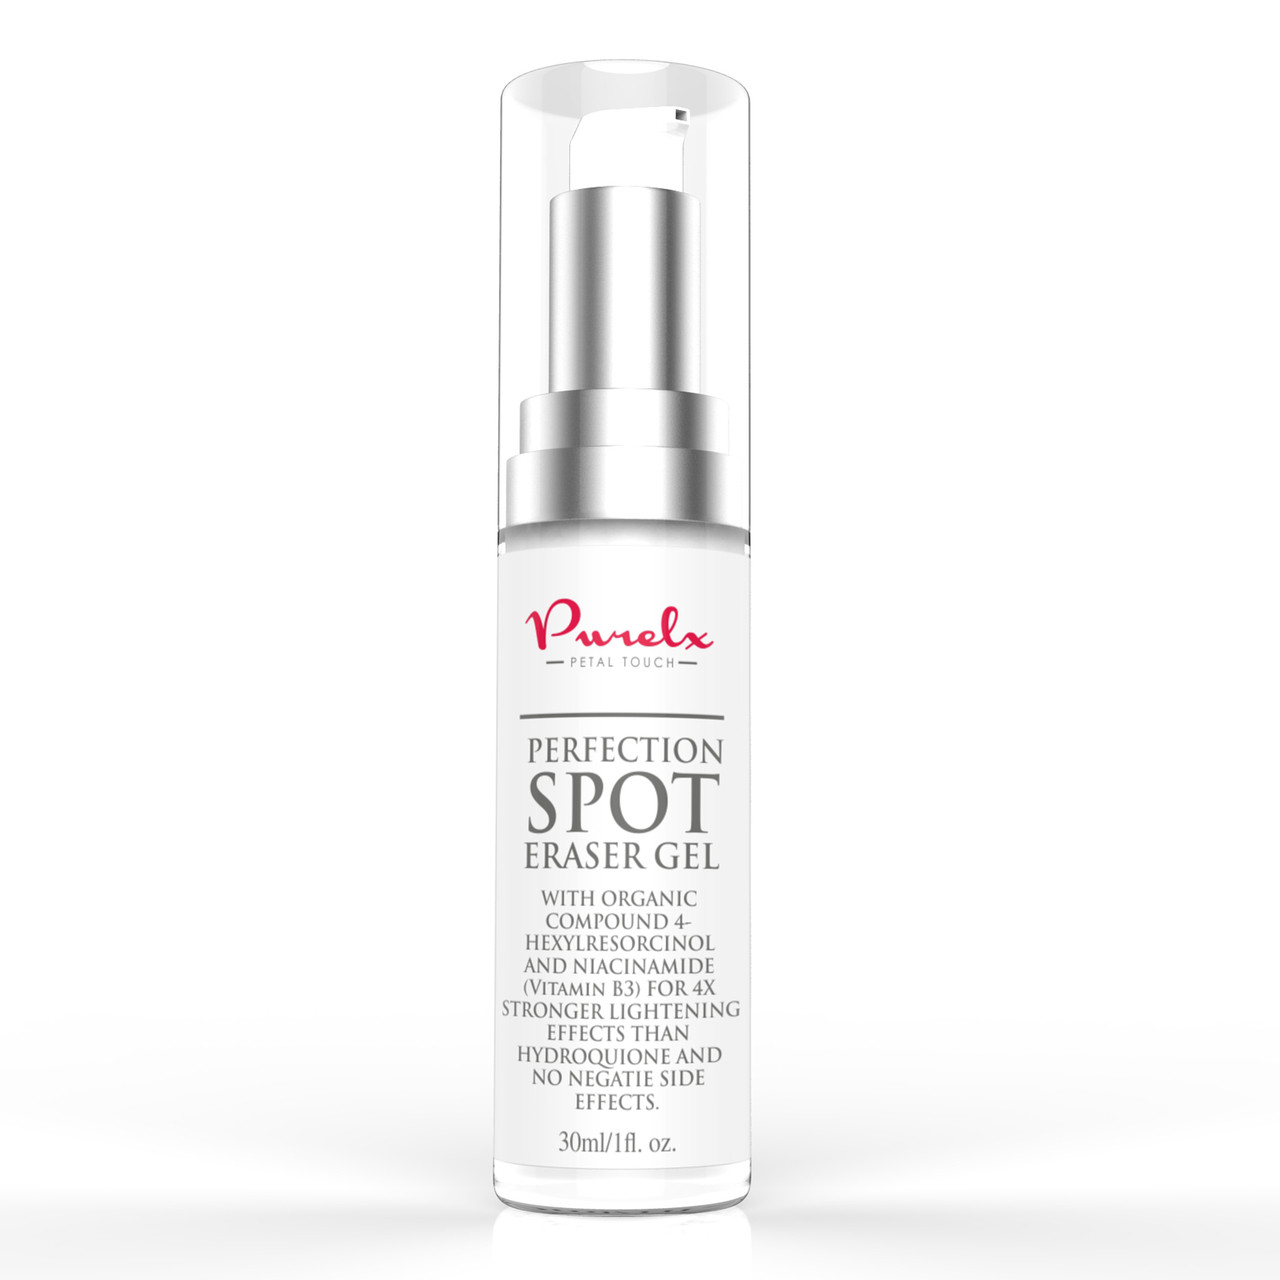 PureLx Perfection Spot Eraser Gel